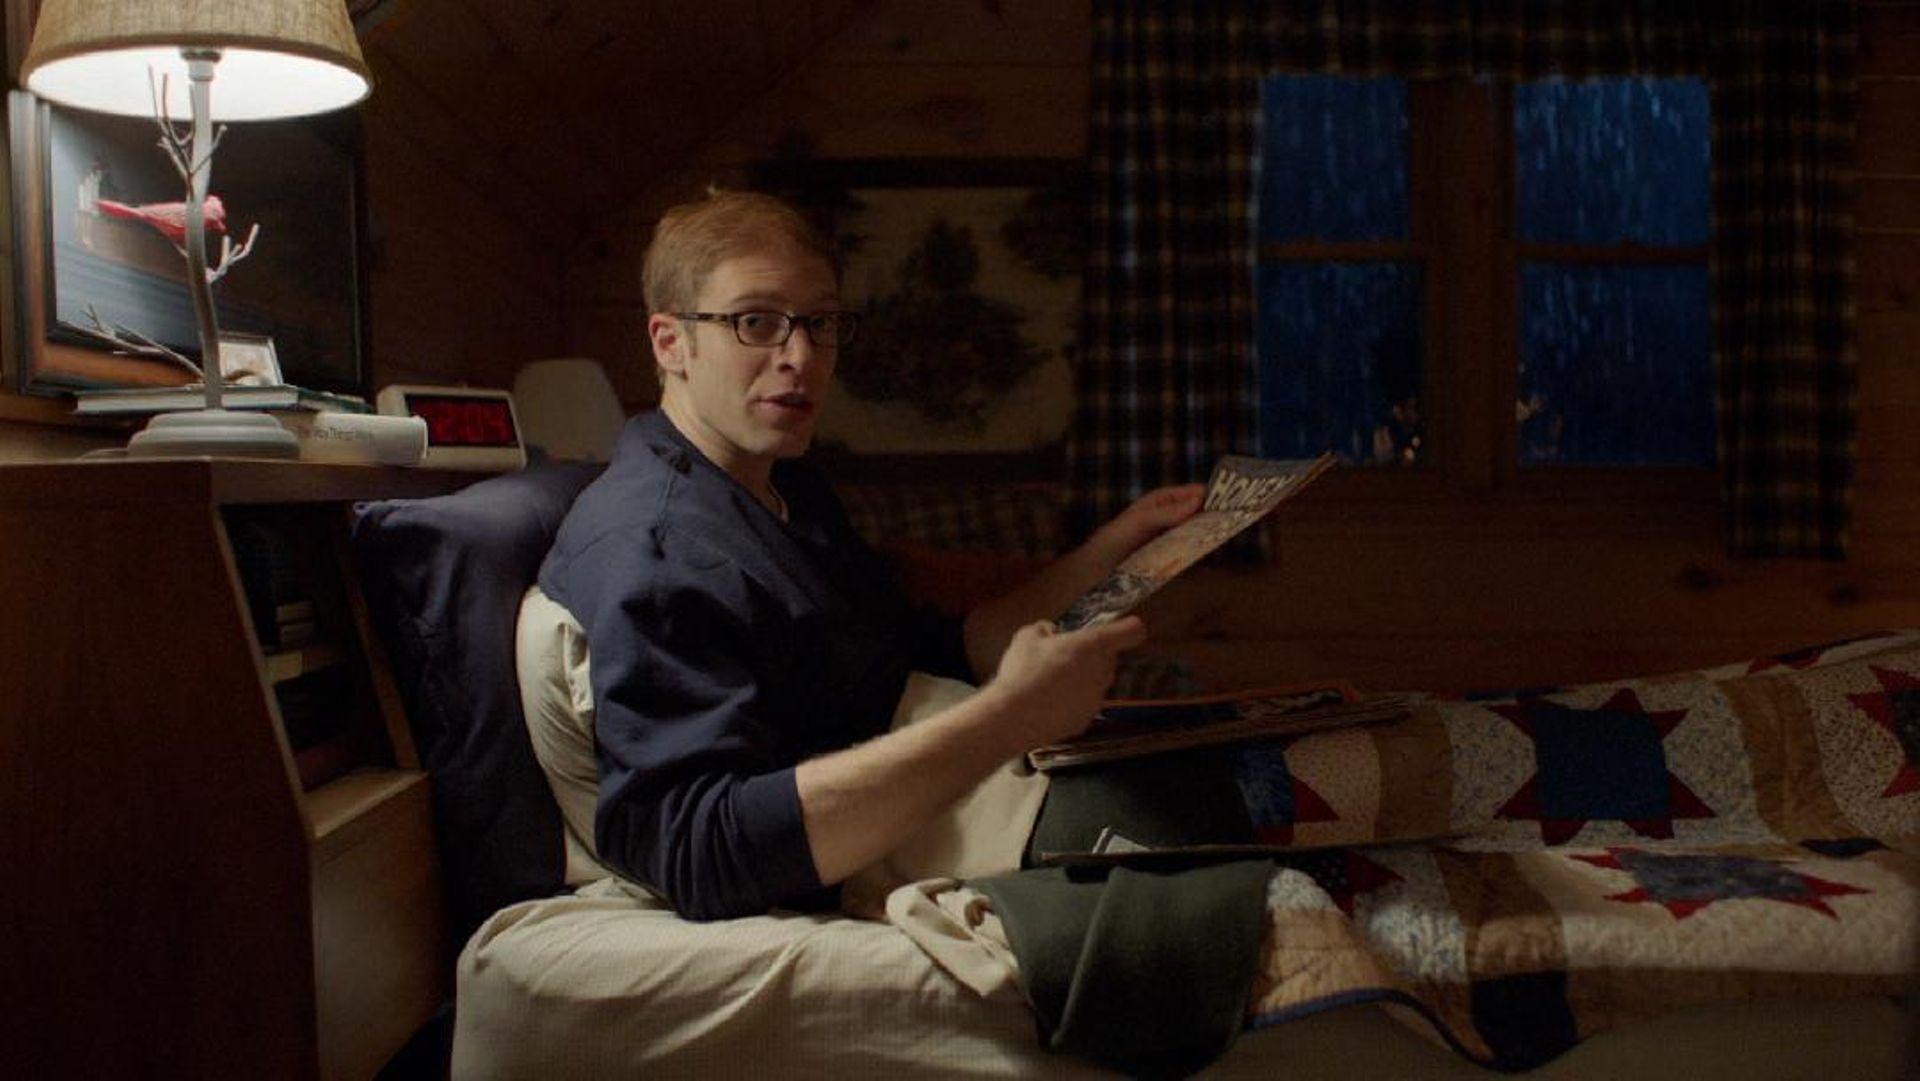 Joe Pera Talks You Back to Sleep - Joe Pera Talks With You - Adult ...